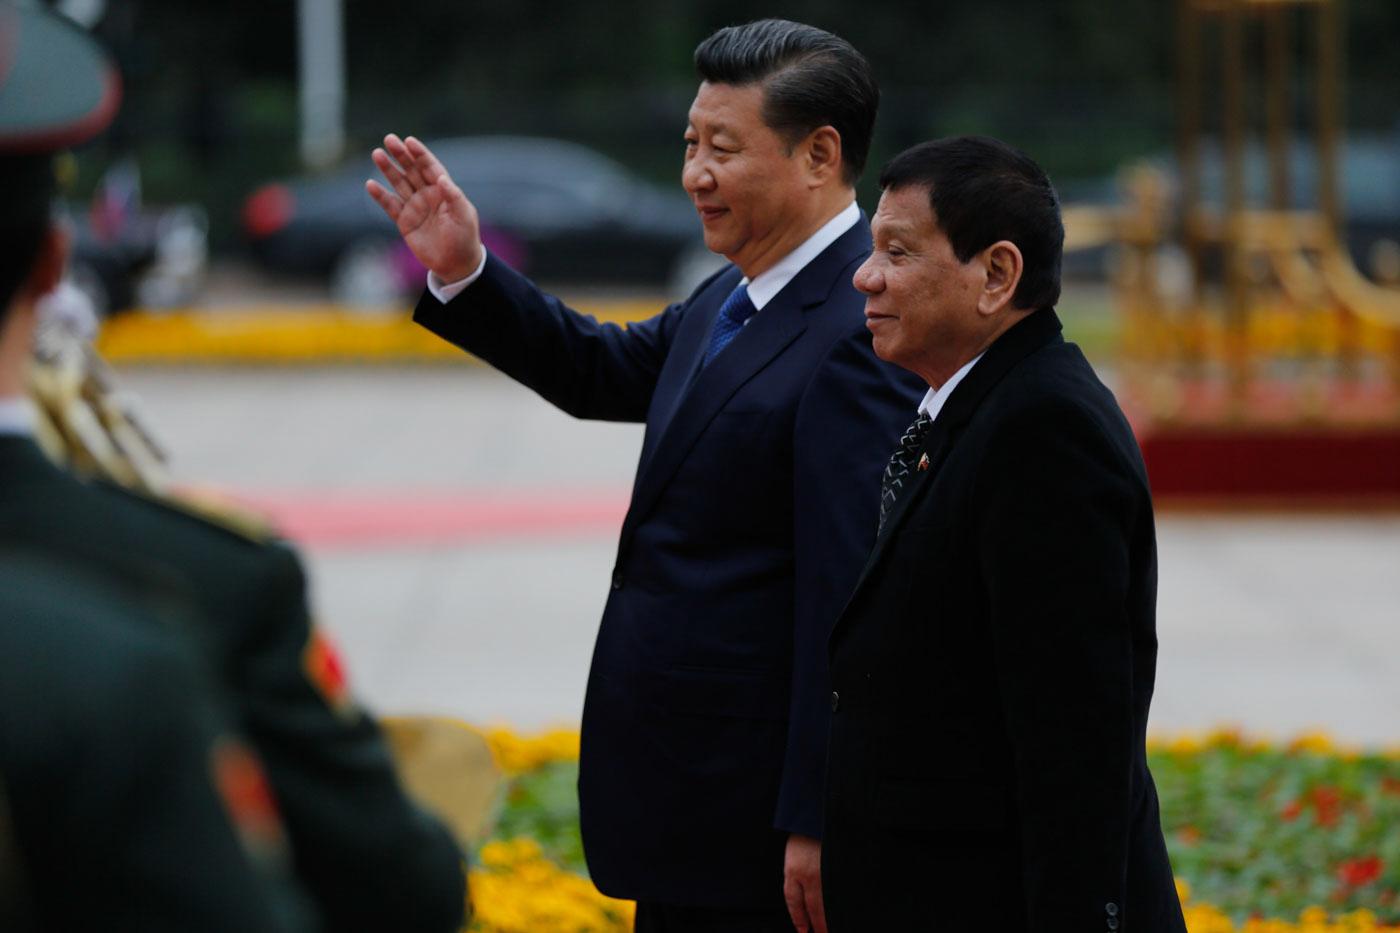 PIVOT TO CHINA. President Rodrigo Duterte has warmed ties with China, setting aside the countryu2019s victory against Beijingu2019s 9-dash-line claim in the South China Sea. Malacau00f1ang file photo